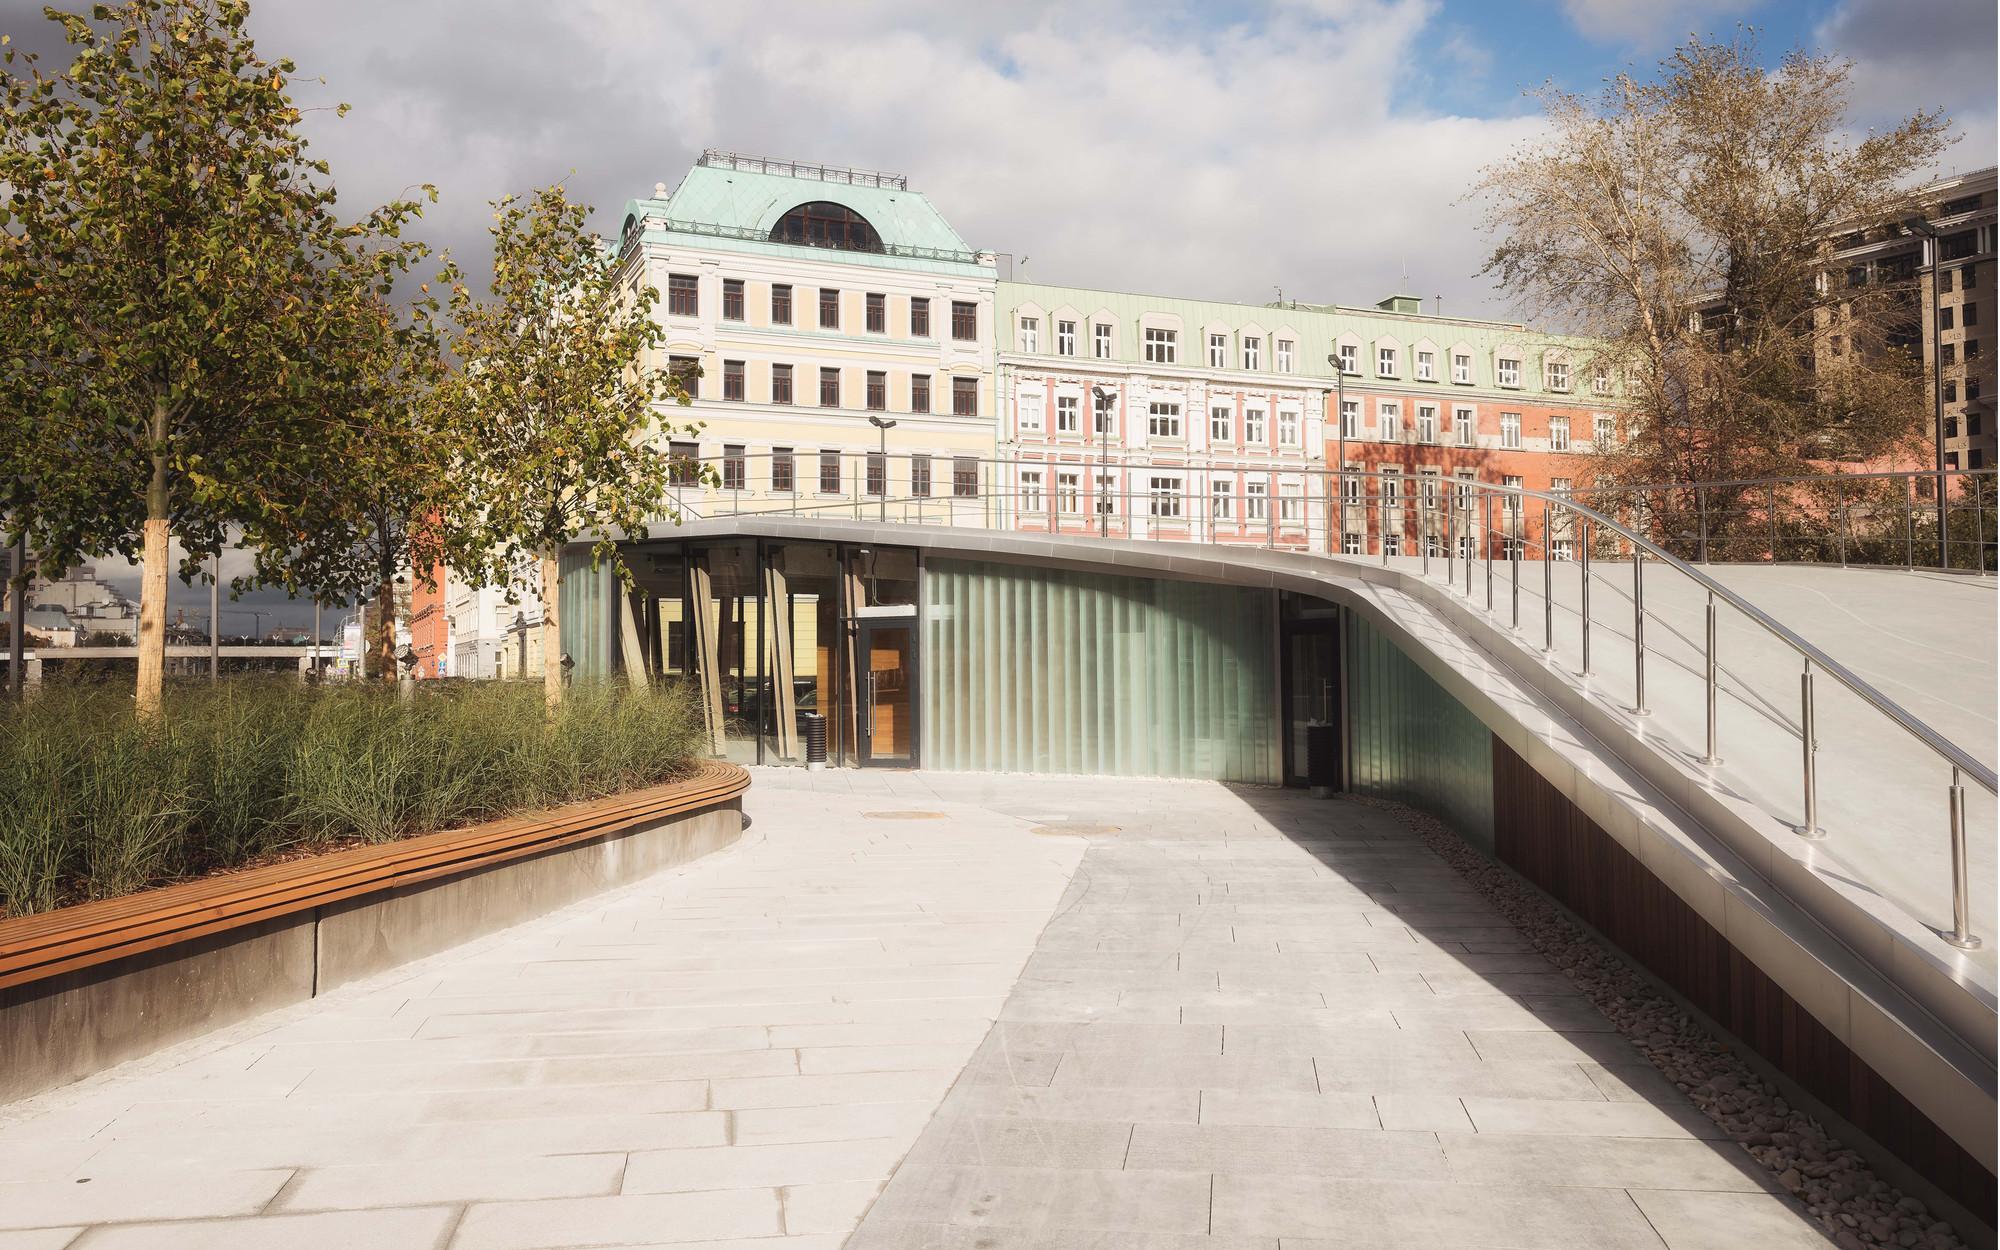 Gallery of krymskaya embankment wowhaus architecture bureau 18